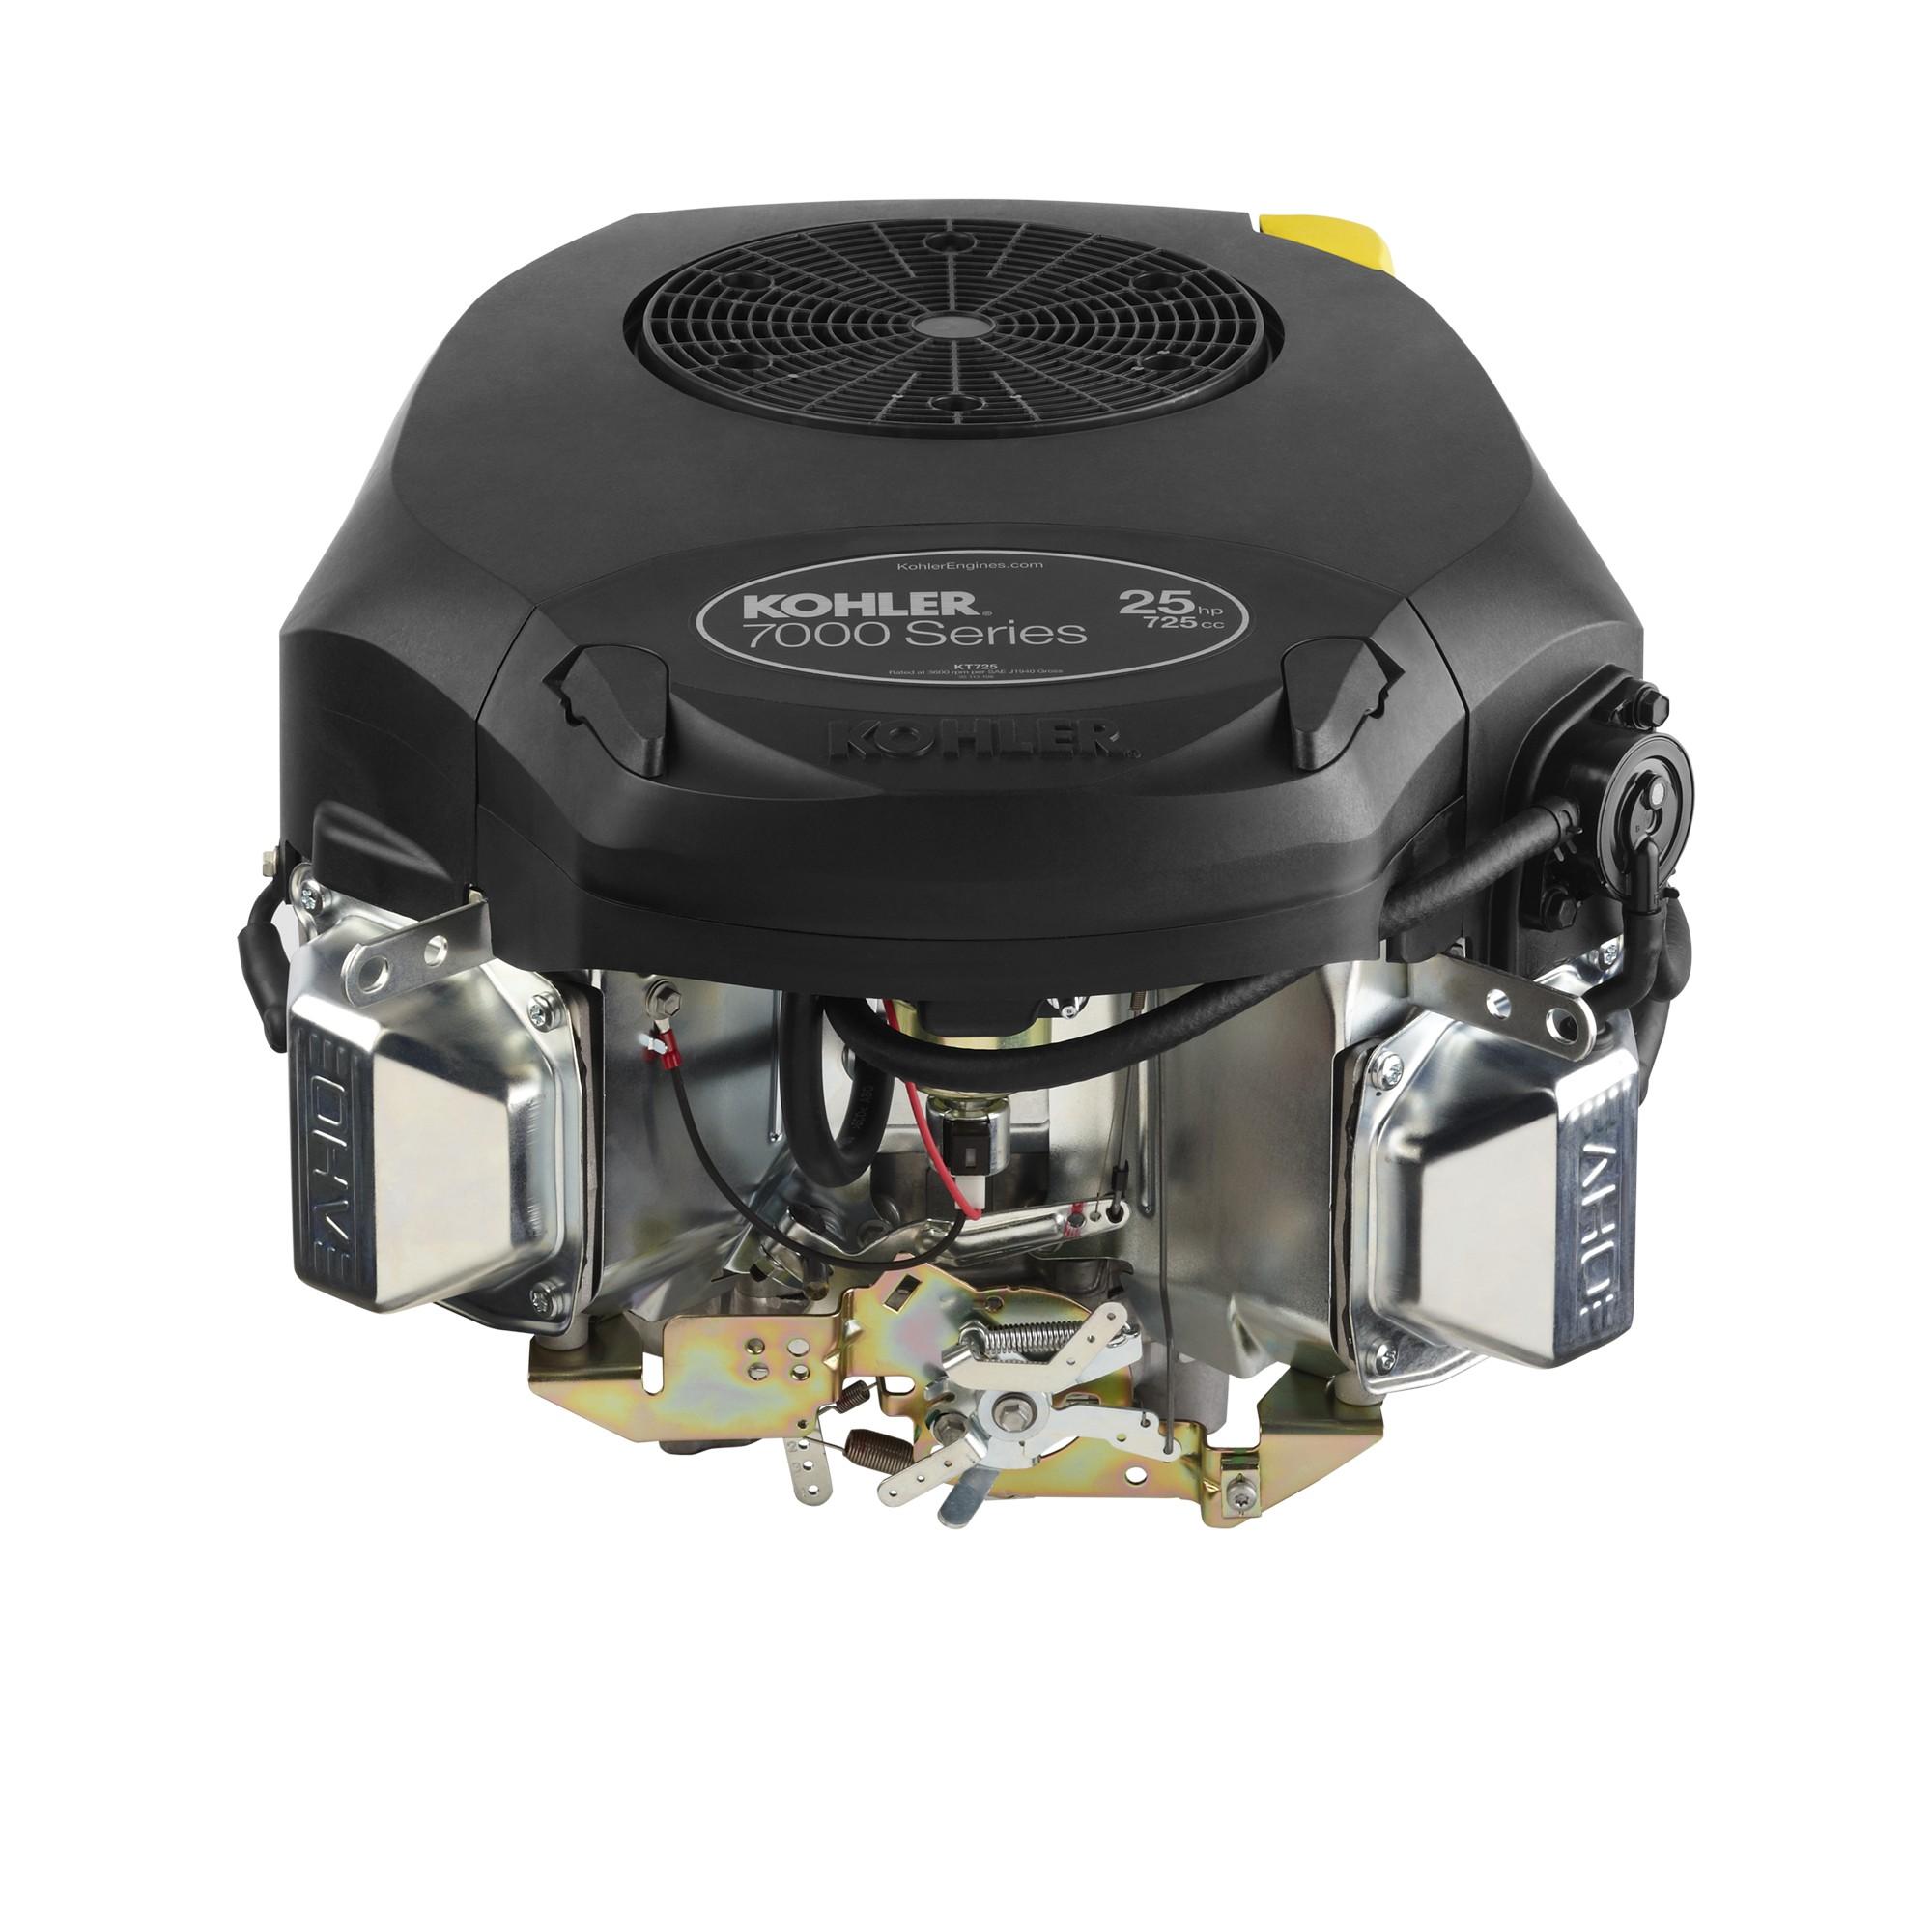 medium resolution of kohler engines kt735 7000 series product detail engines kohler marine generator wiring diagram kohler 7000 generator wiring diagram